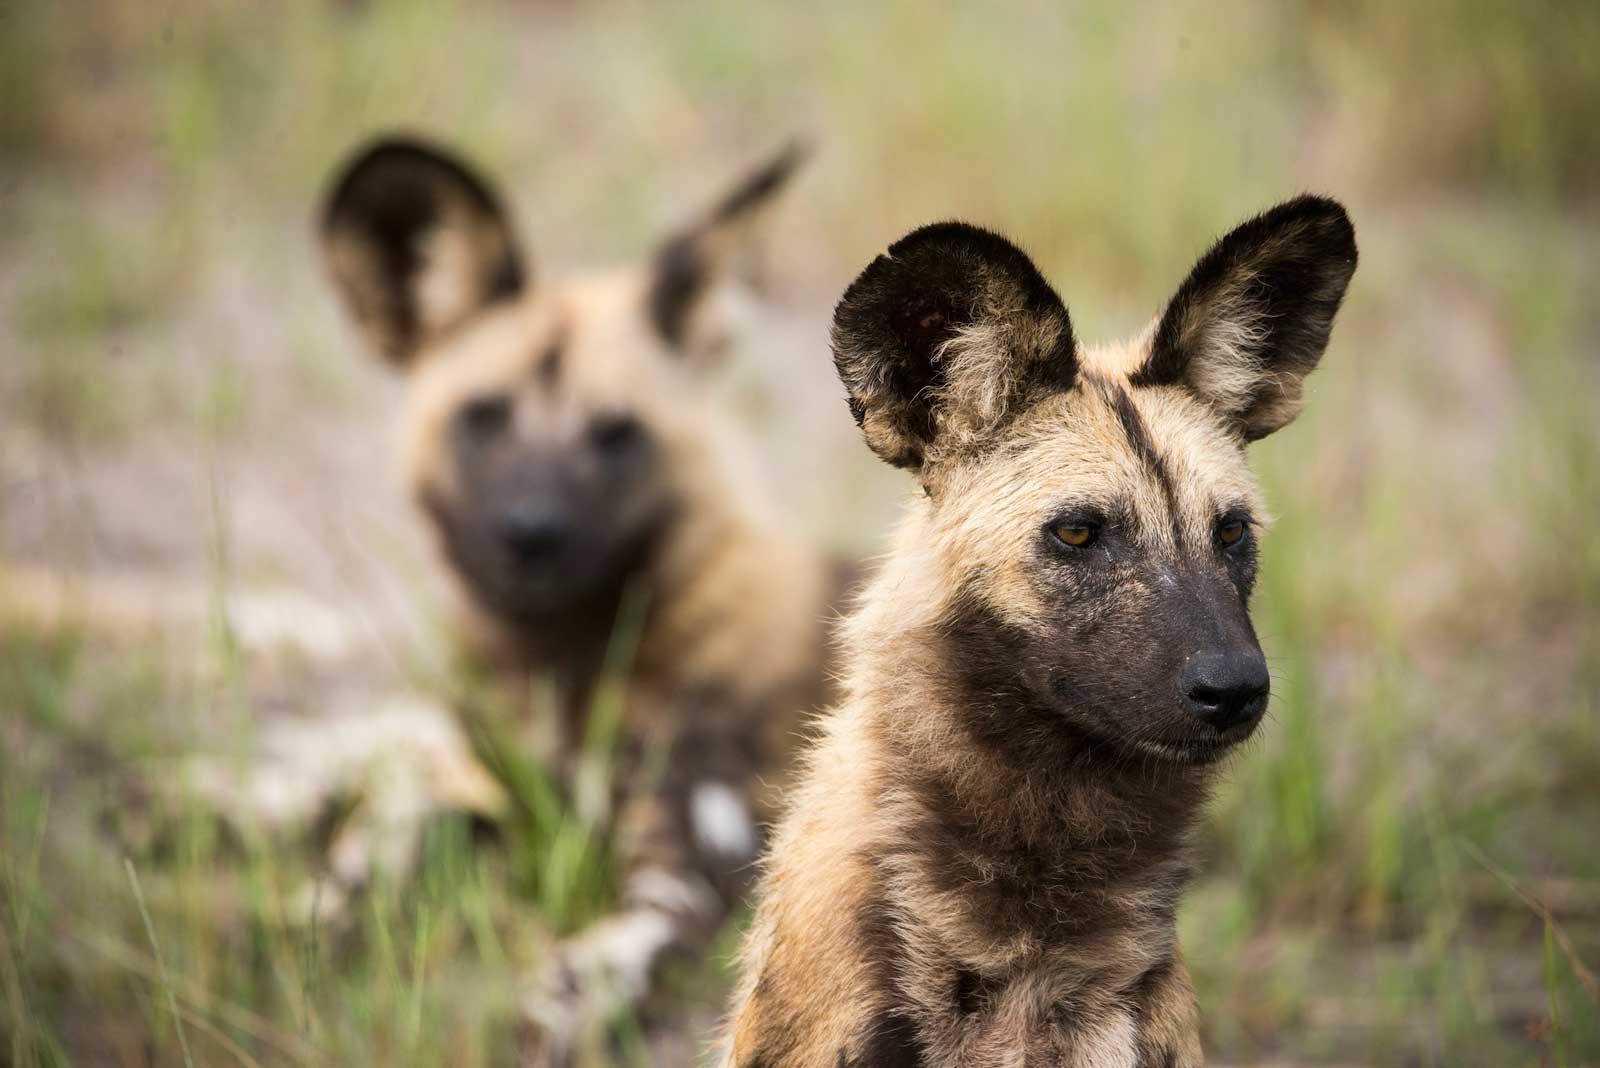 RAW Botswana Wild Dogs